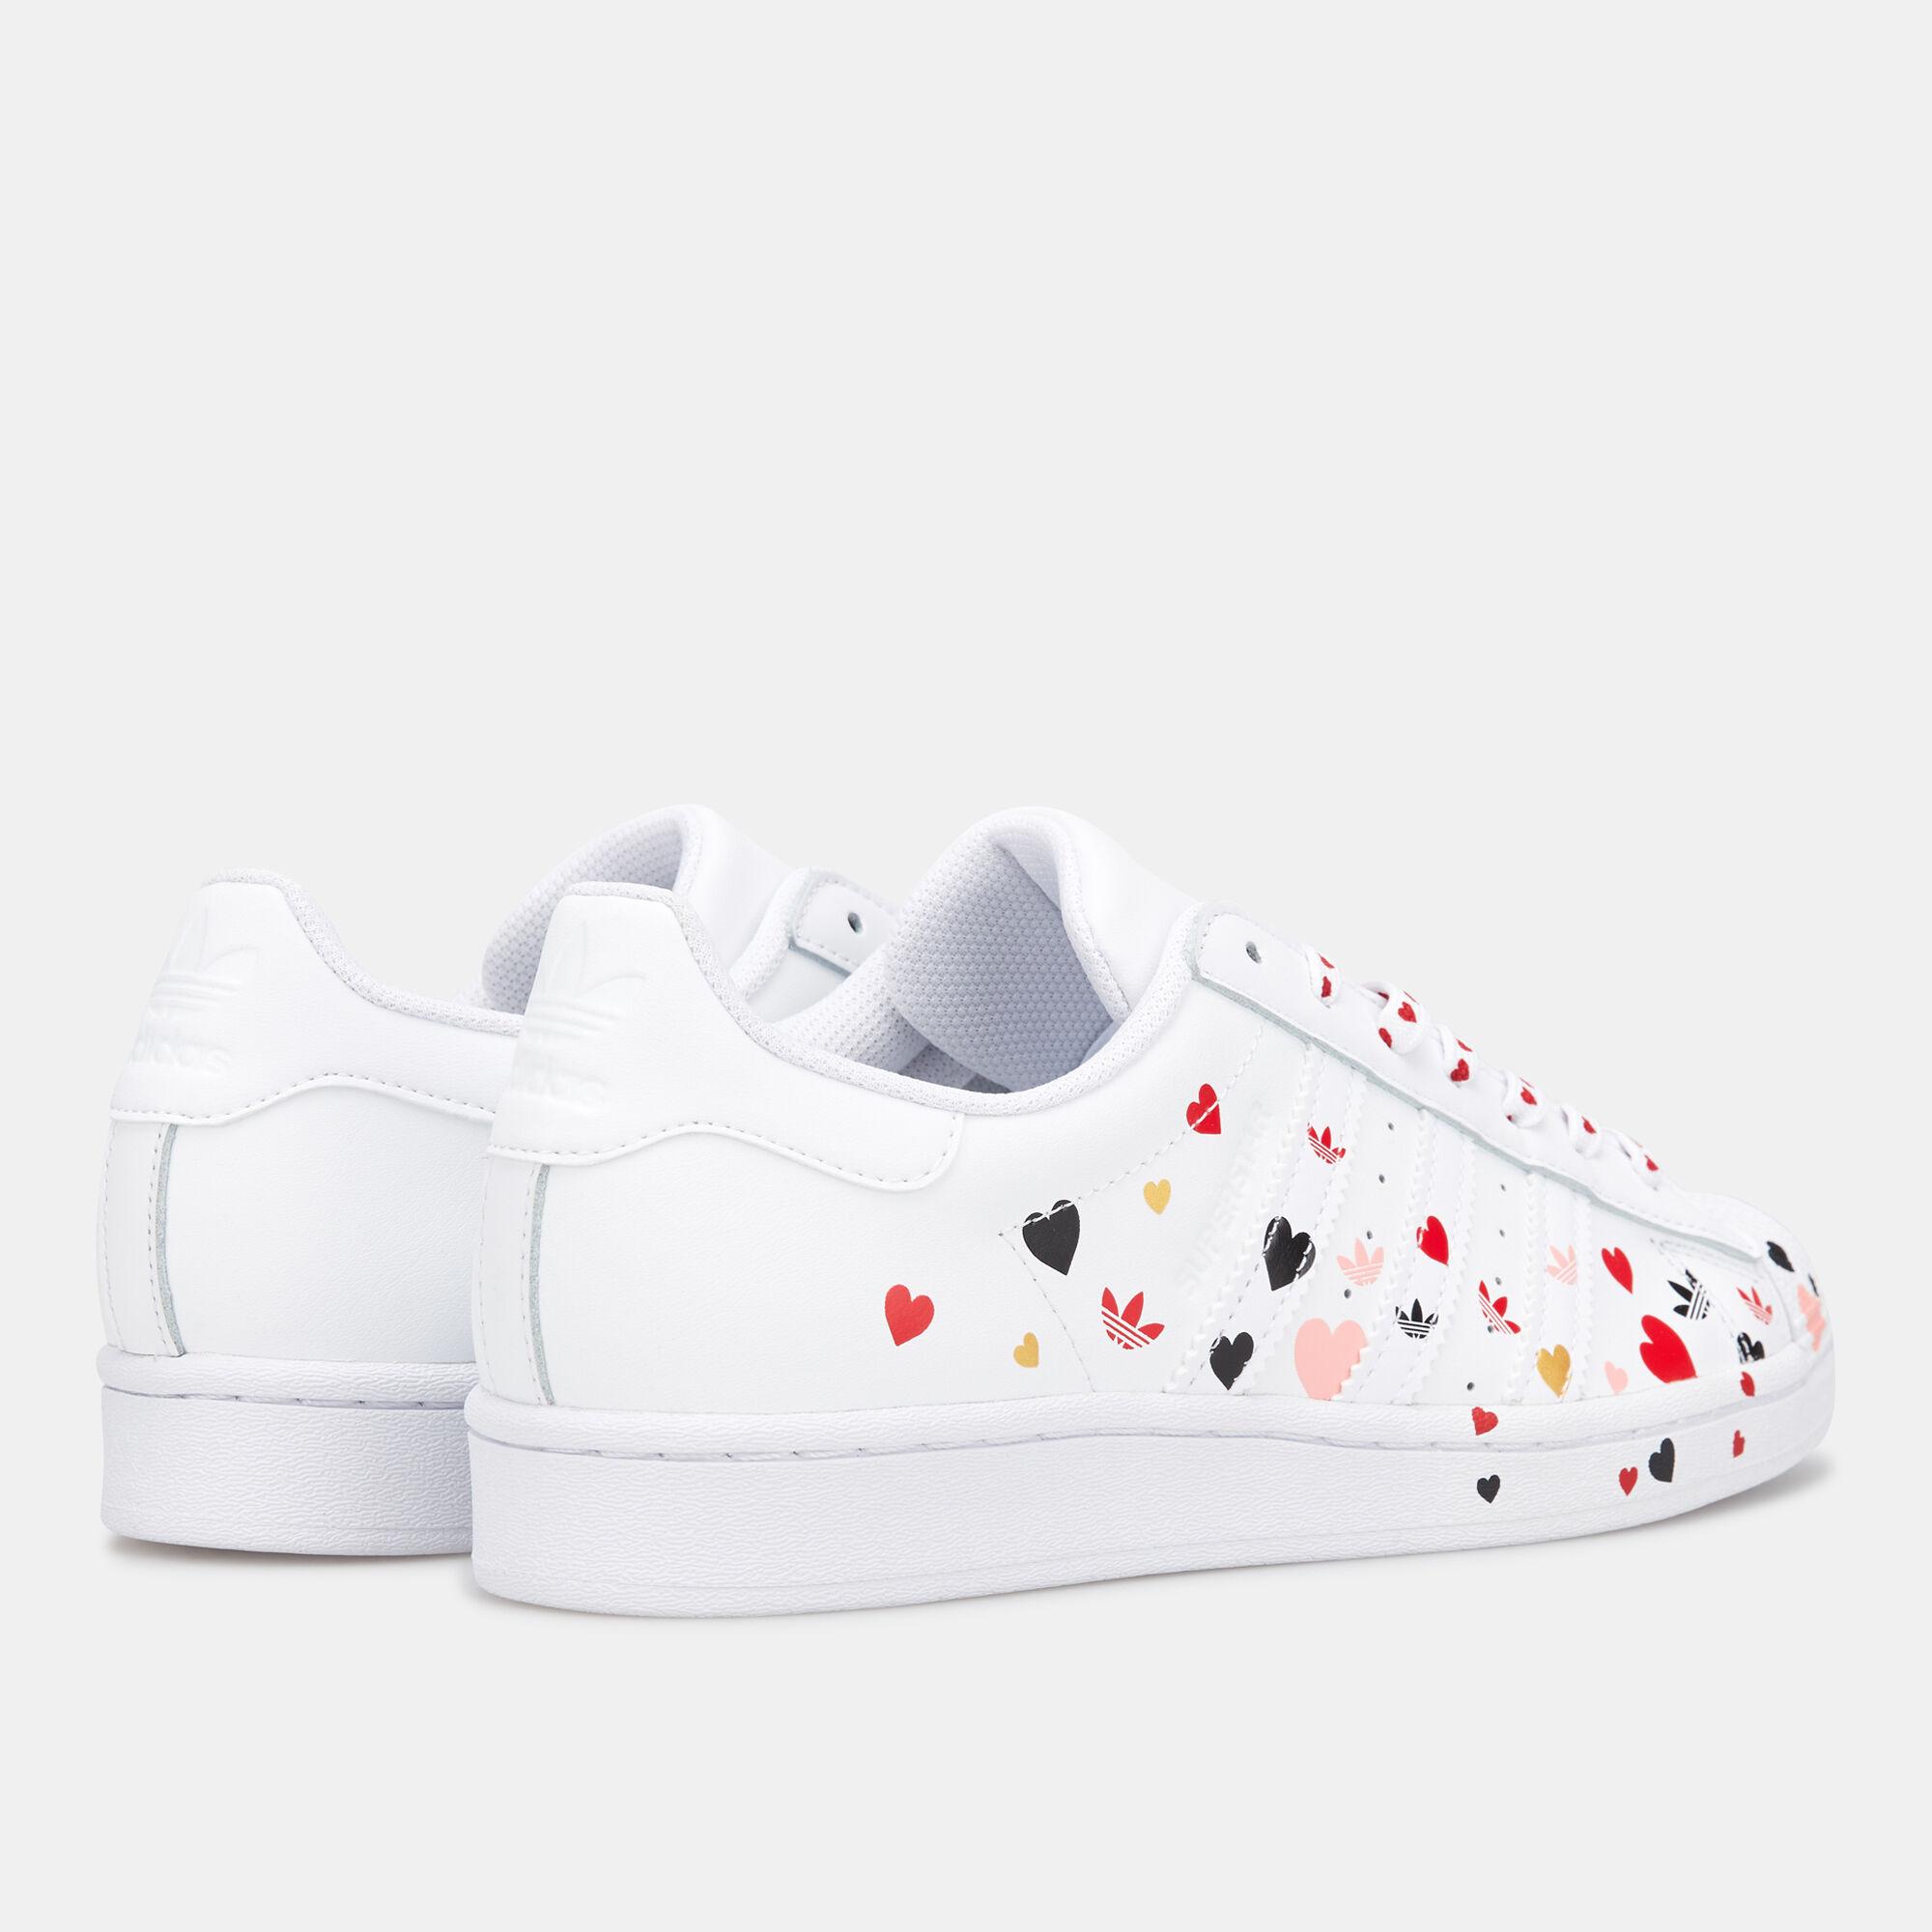 nike superstar shoes